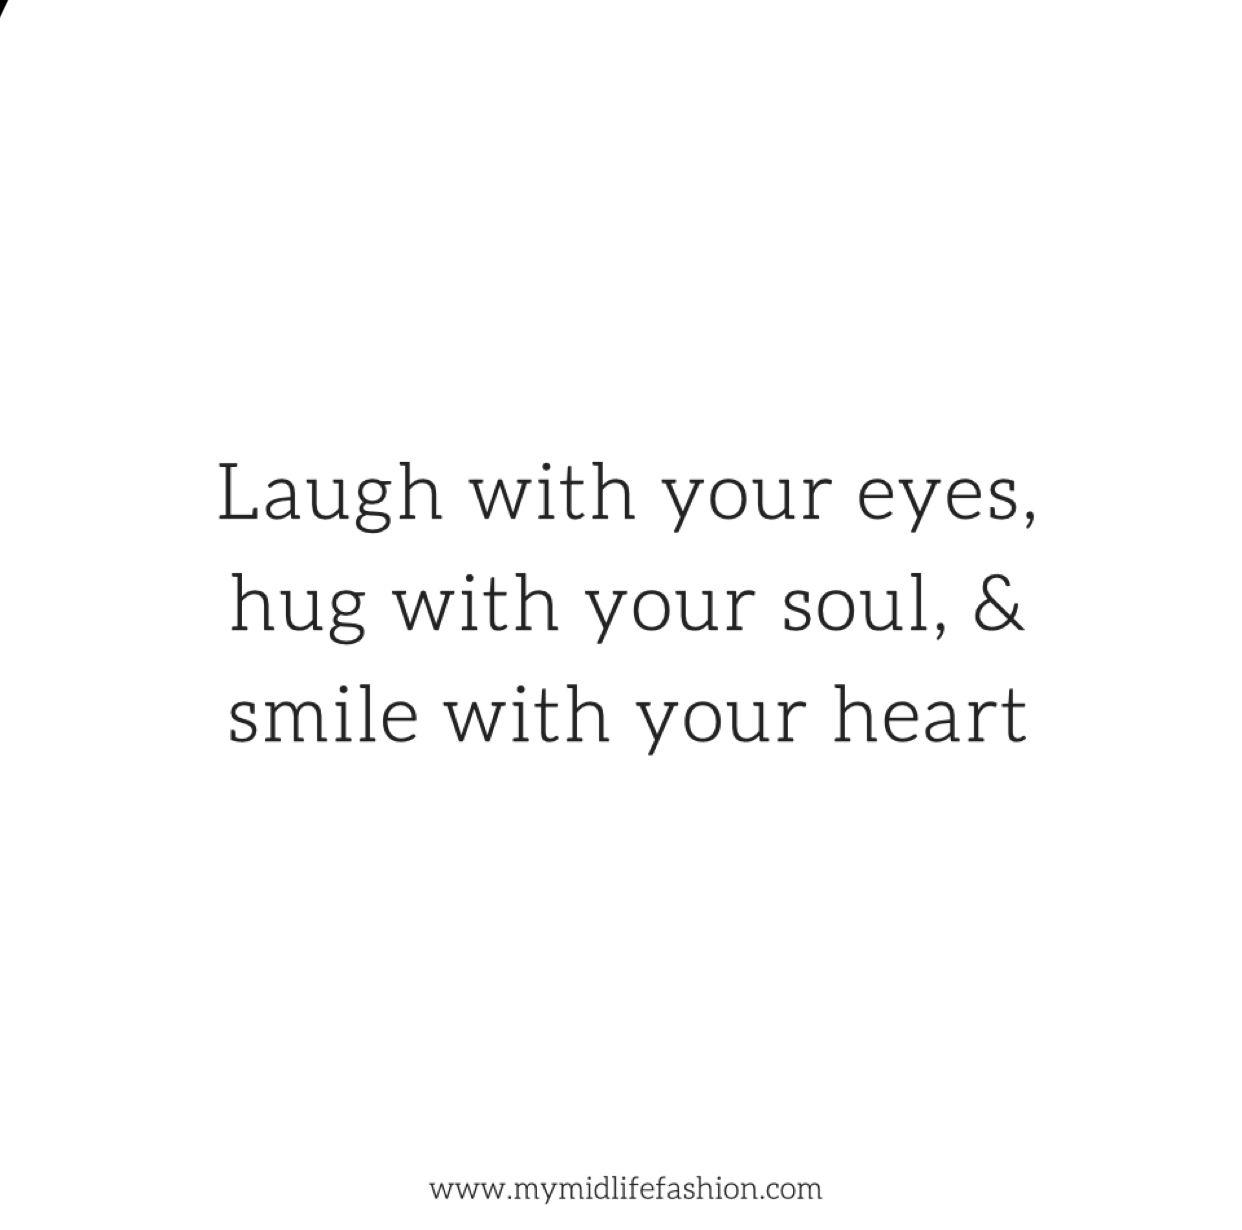 quote  quotes  qotd  quoteoftheday  saying  sayings  sayingstoliveby  laugh  love  smile  soul  hug